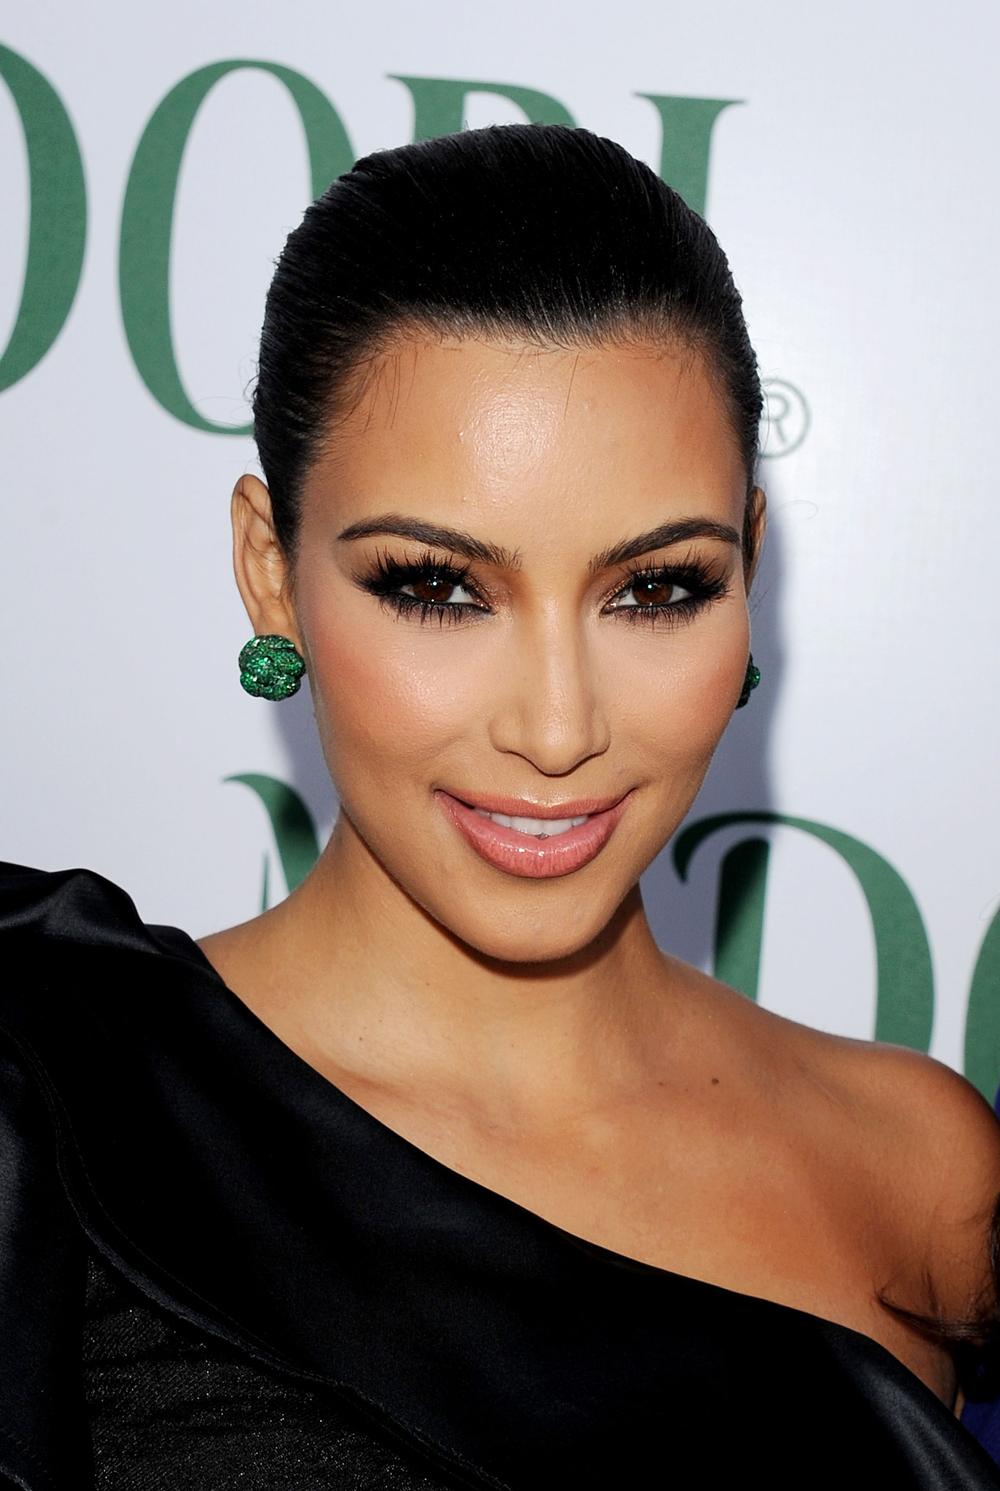 Kim Kardashian Black Ponytail Hairstyles 09